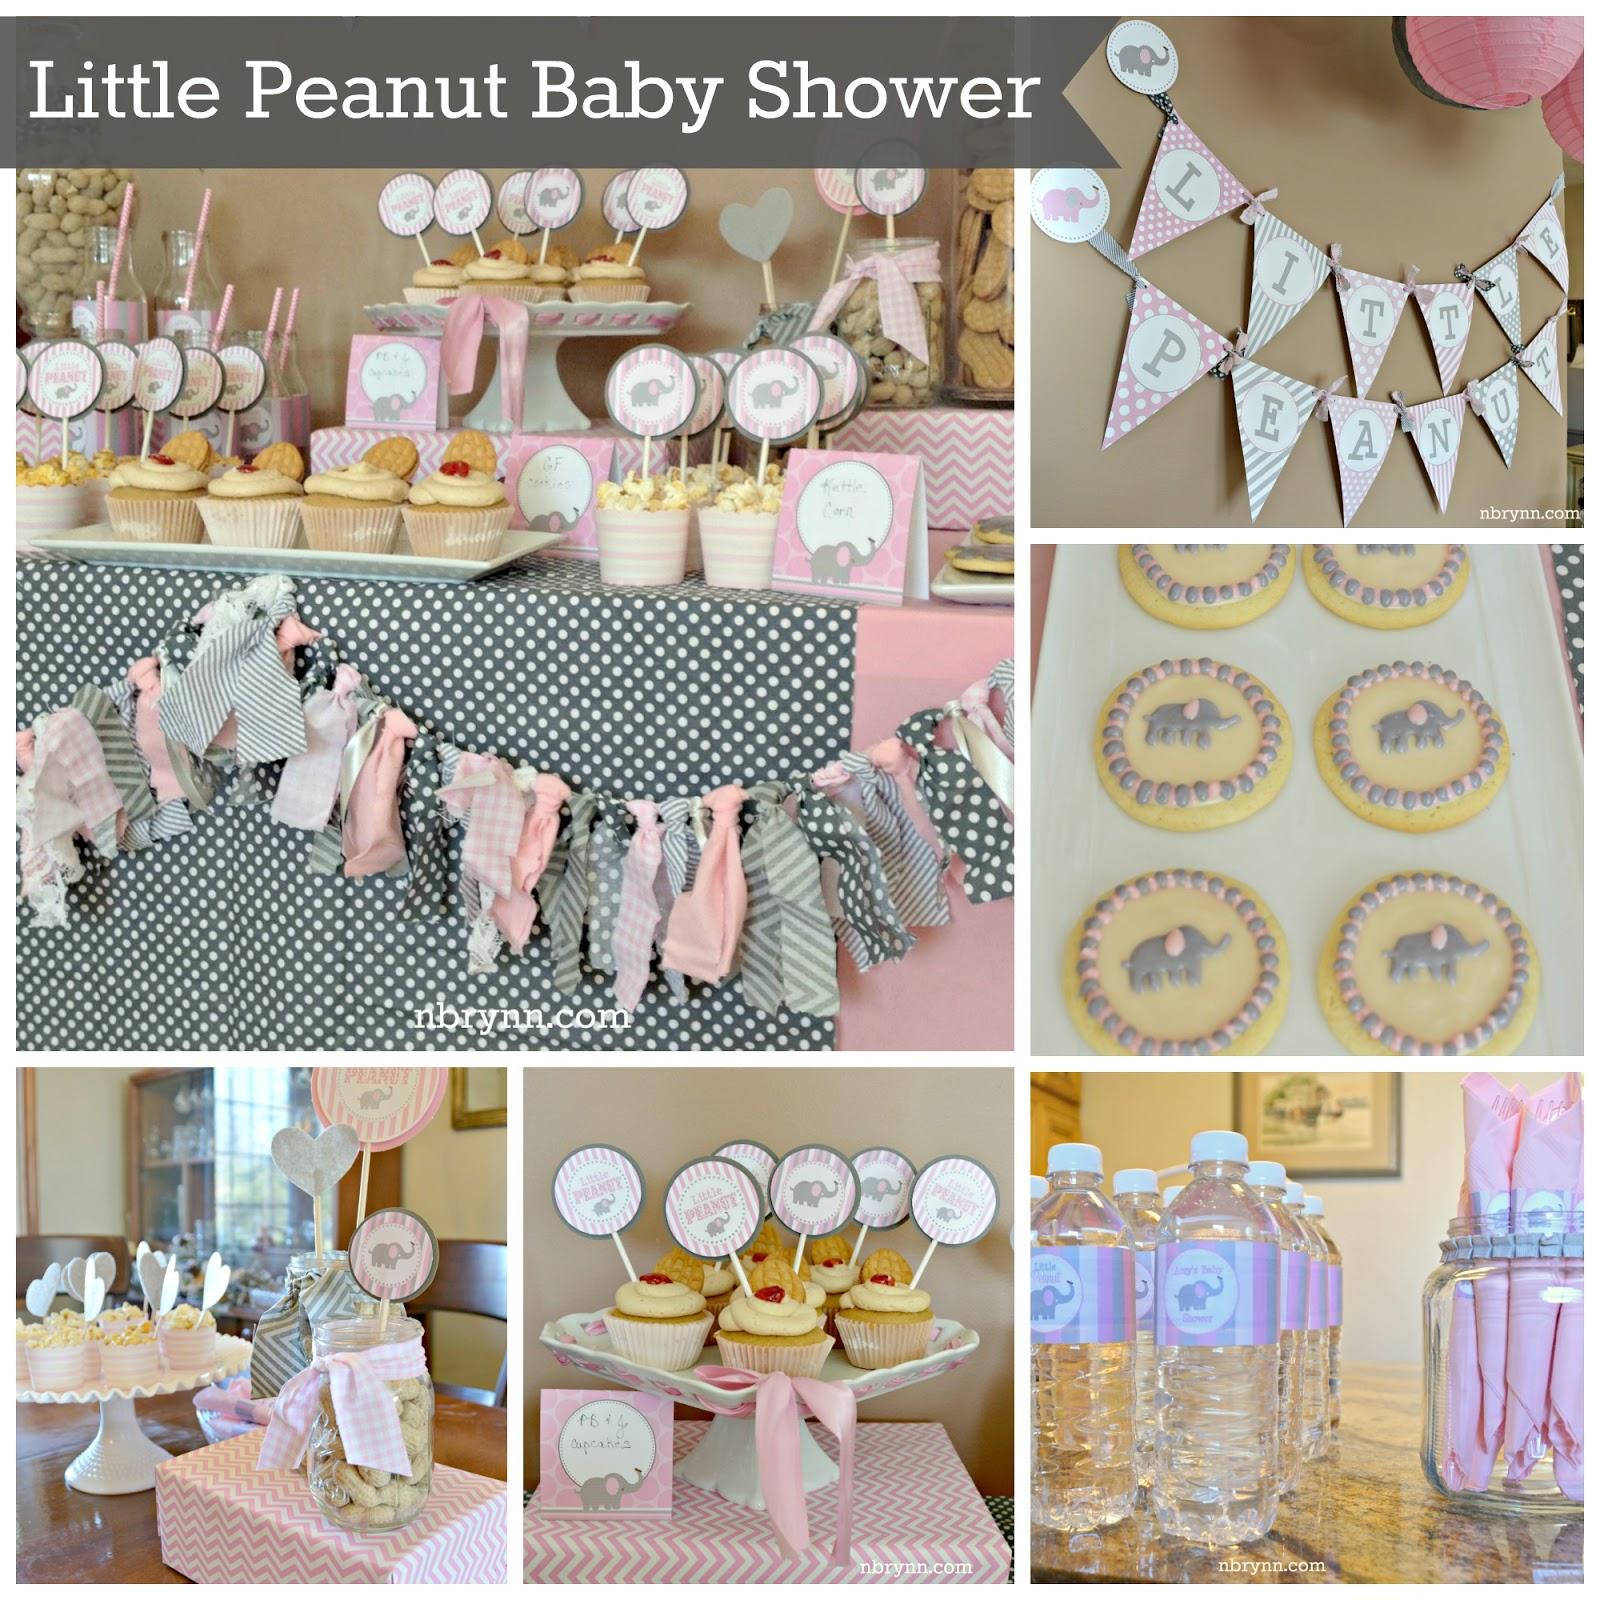 NBrynn: Little Peanut Baby Shower